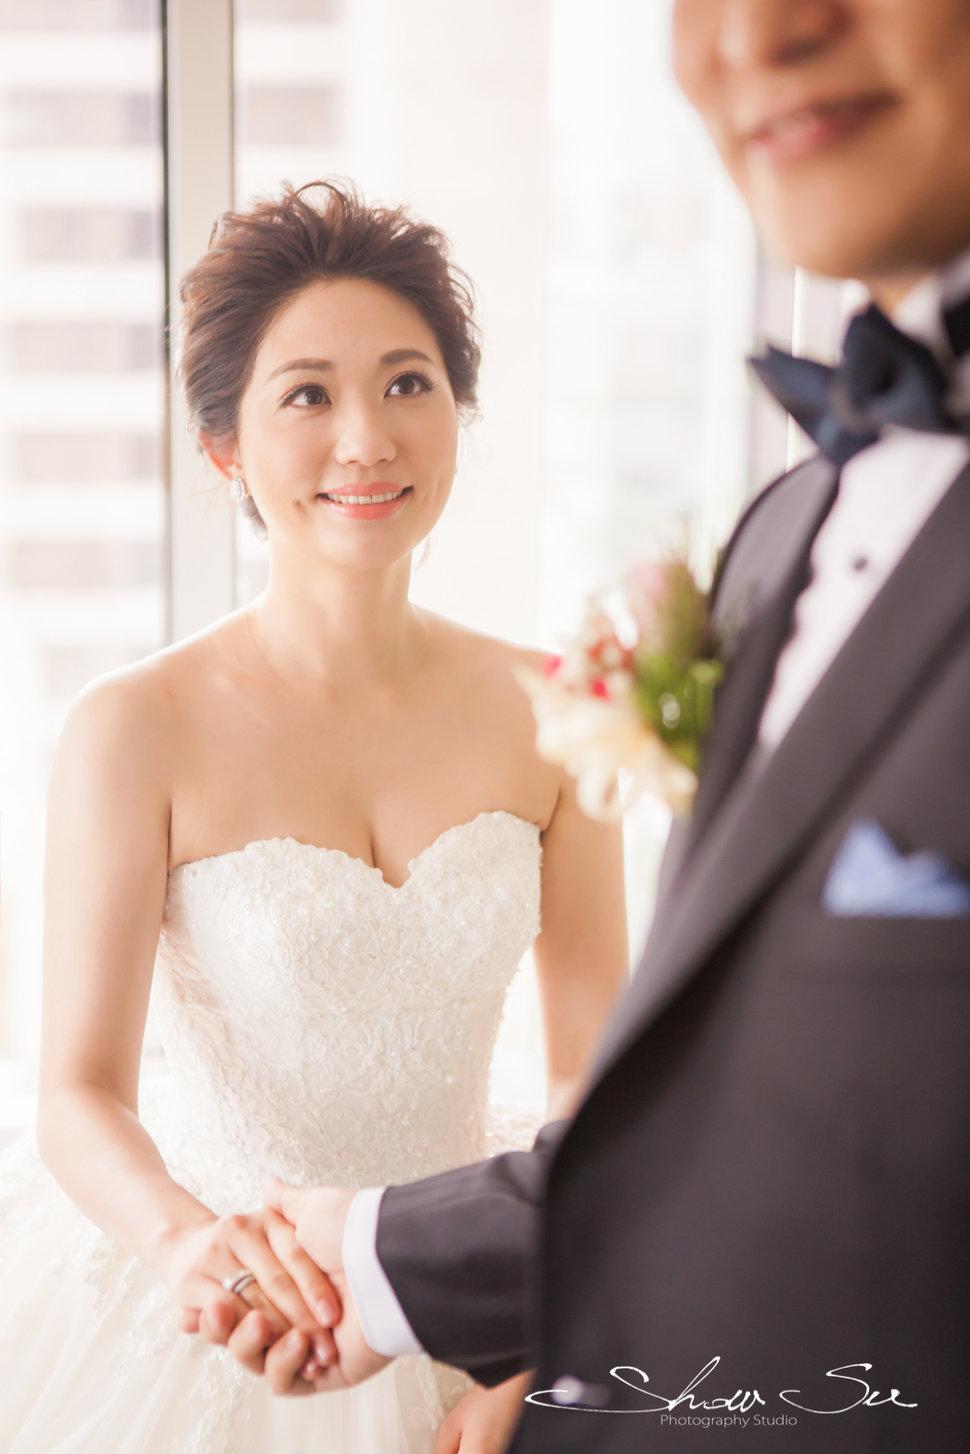 IMG-117 - Show Su Photography《結婚吧》